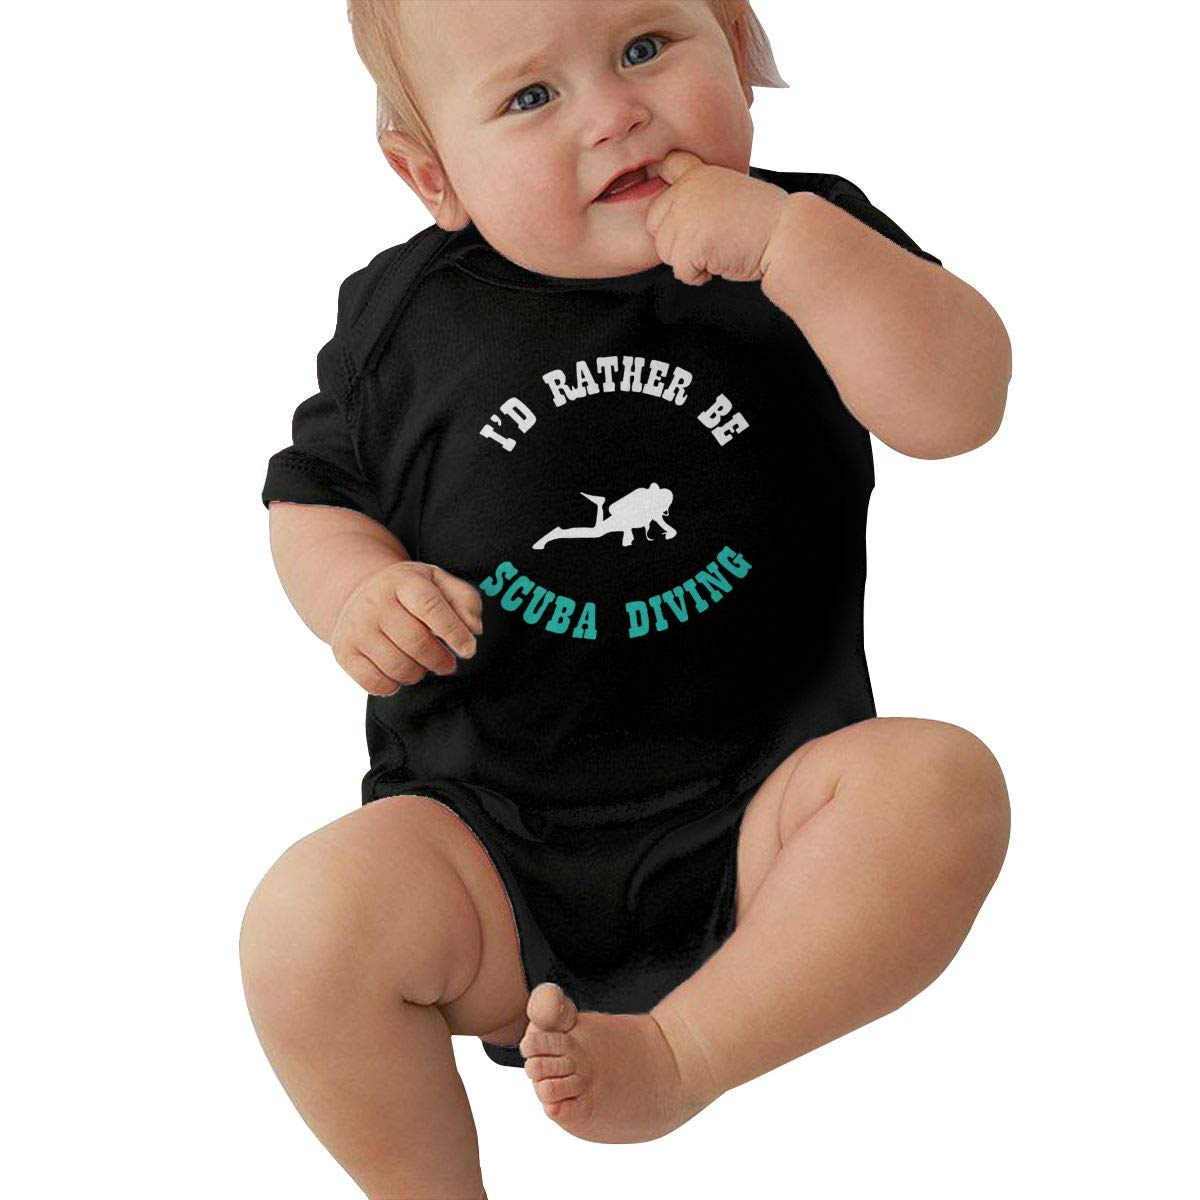 LBJQ9 Id Rather Be Scuba Diving Newborn Kids Baby Boys Soft /& Breathable Short Sleeve Romper Jumpsuit